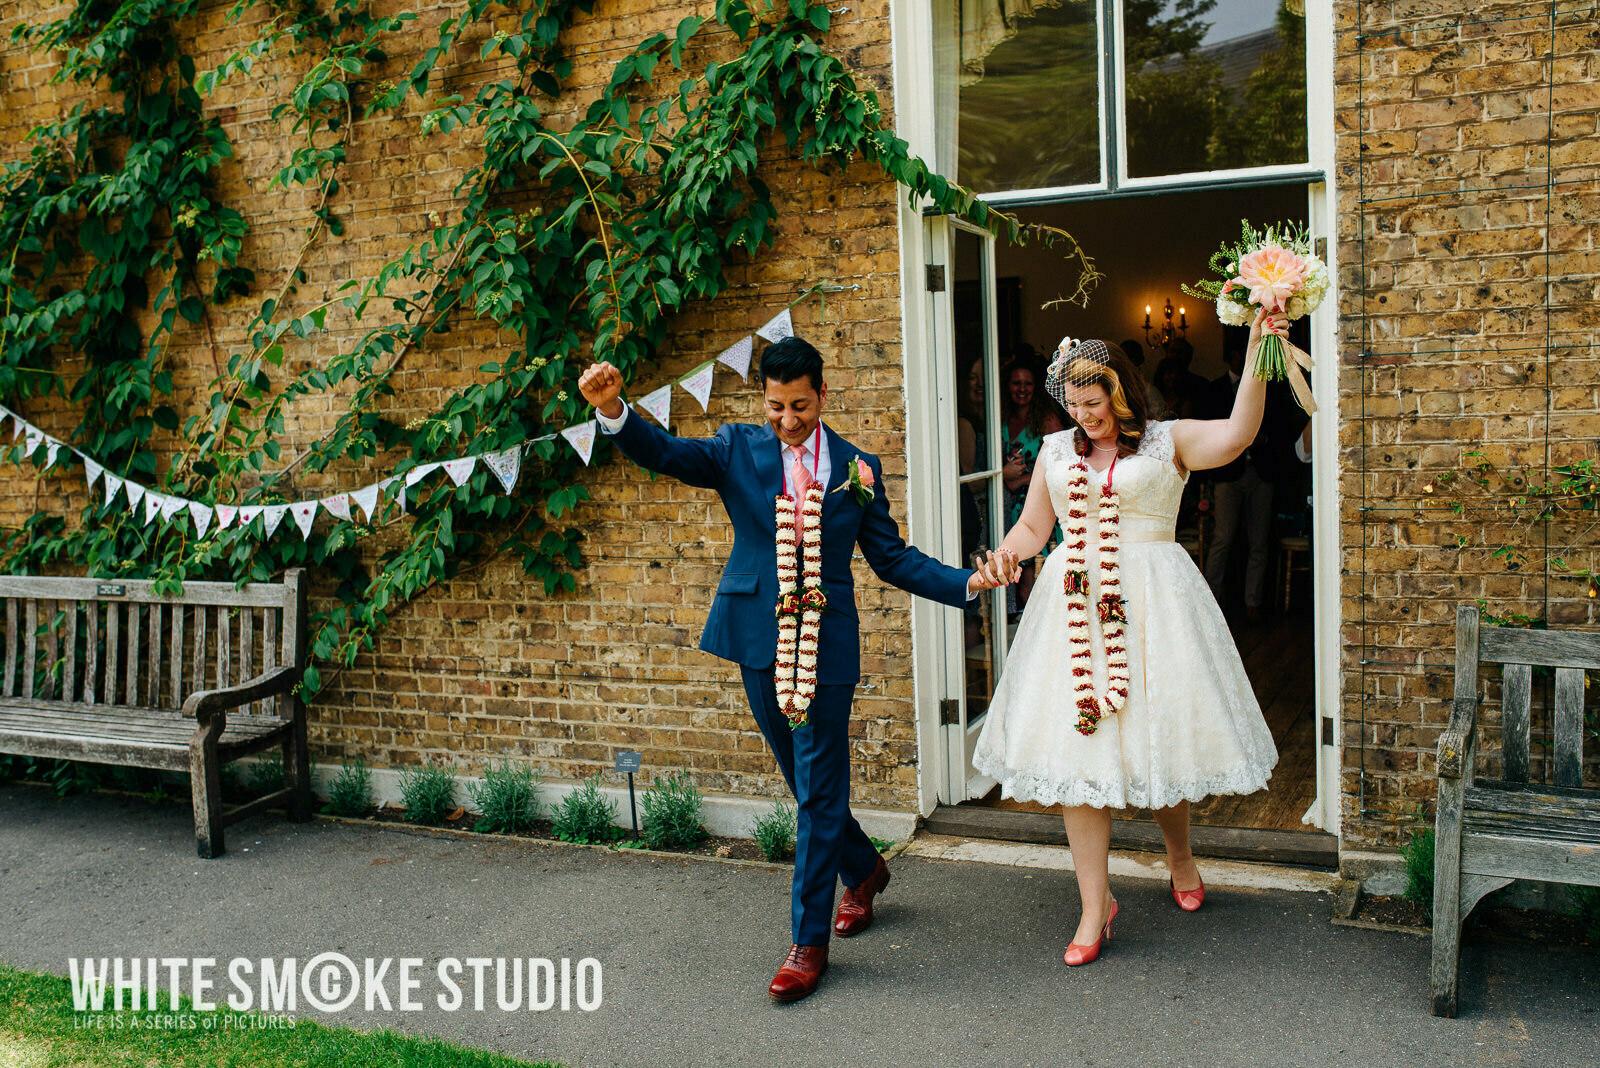 harriet_sanjeev_kew_garden_094_cambridge_cottage_wedding